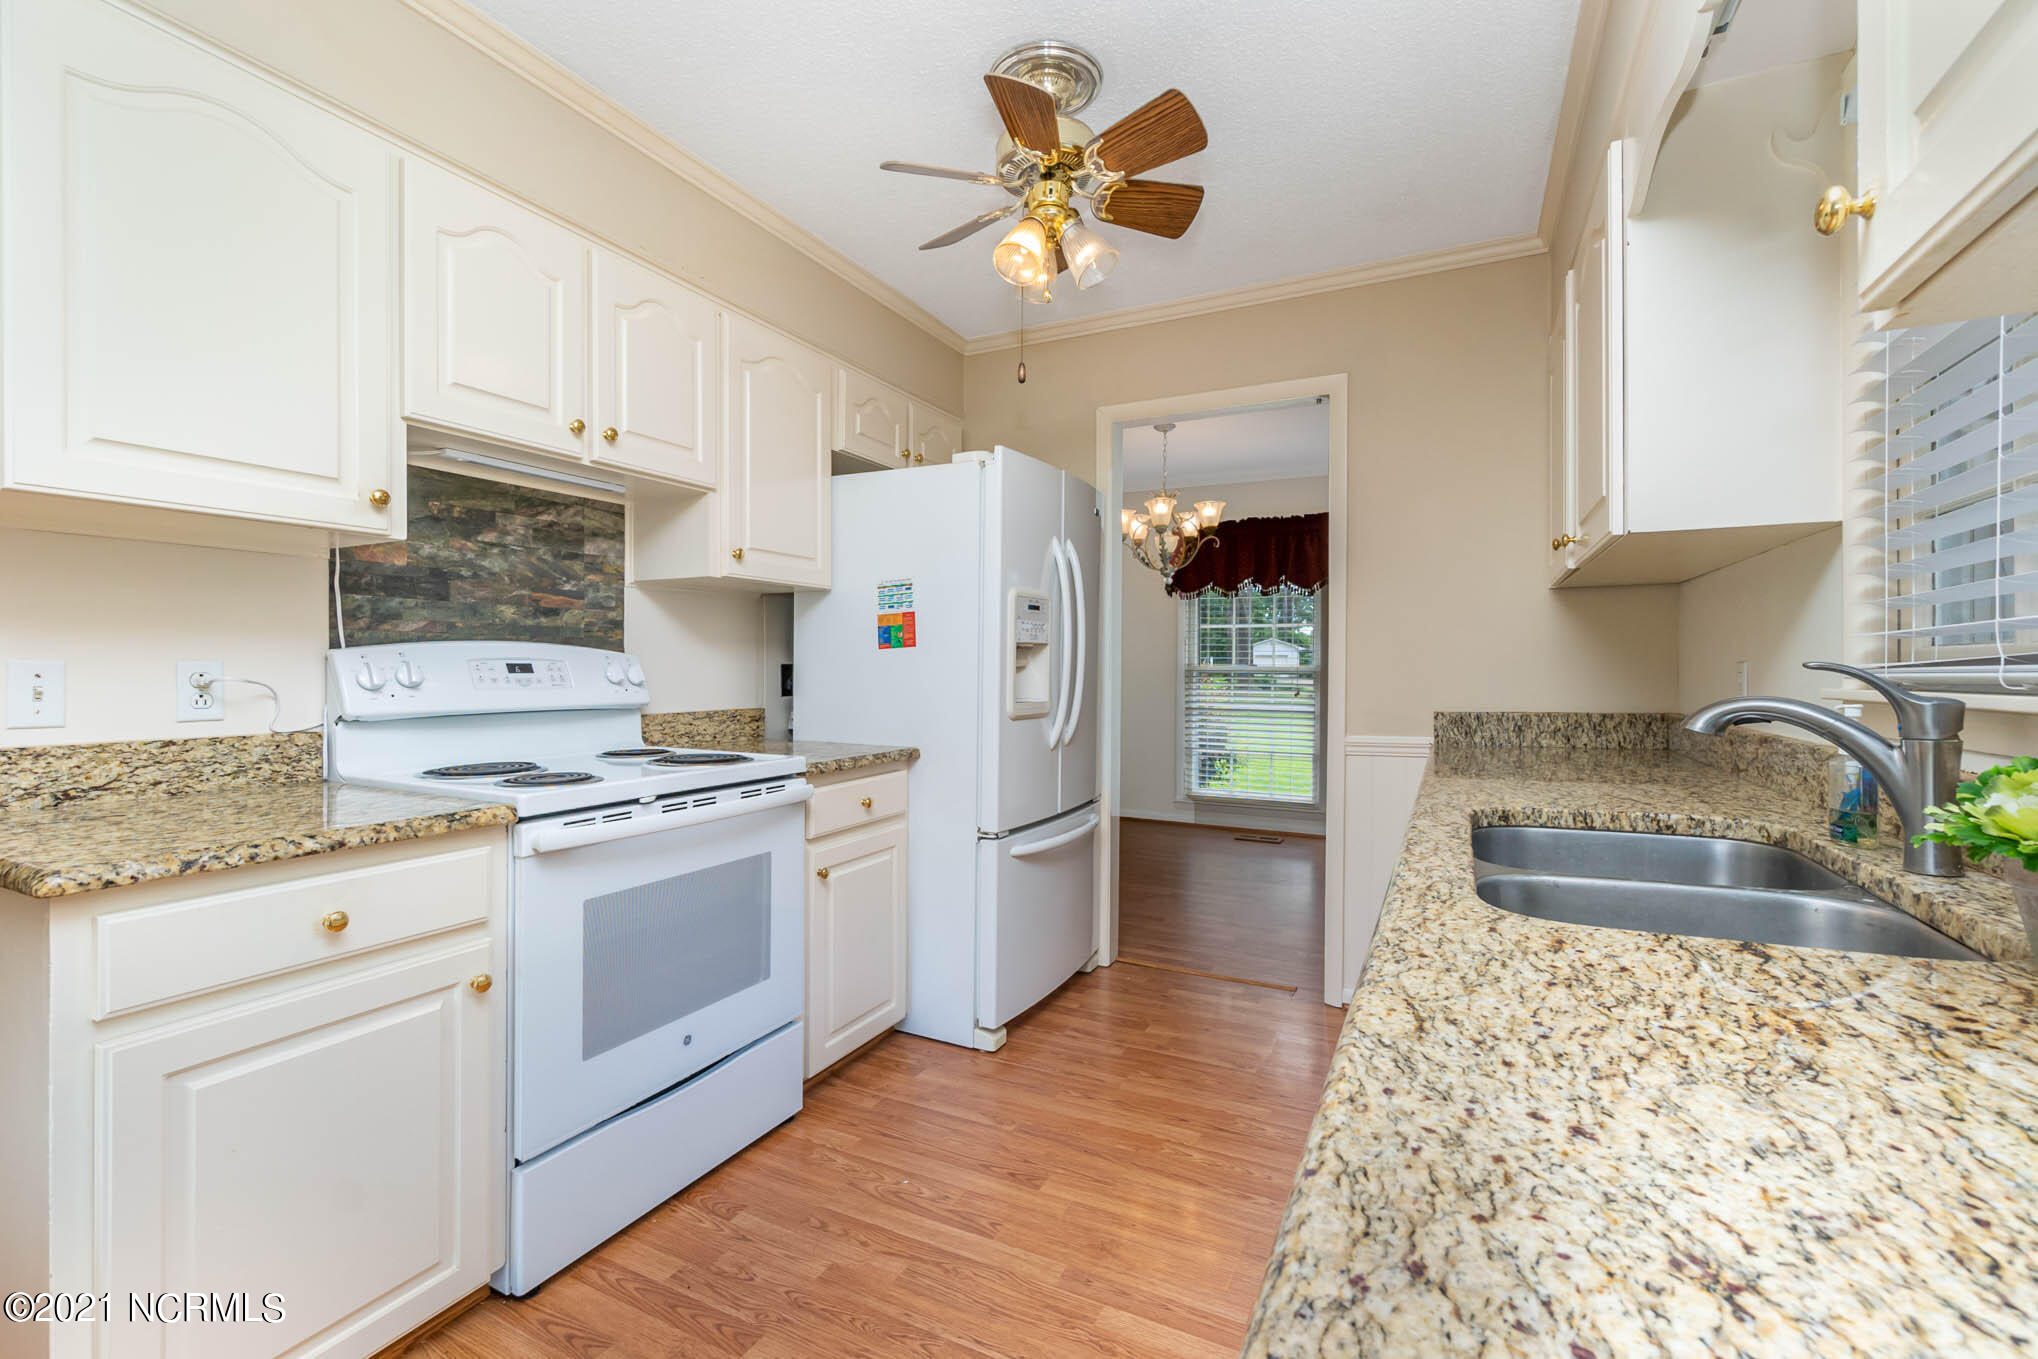 706 Walking Stick Trail, Clinton, North Carolina 28328, 3 Bedrooms Bedrooms, 7 Rooms Rooms,2 BathroomsBathrooms,Single family residence,For sale,Walking Stick,100277365